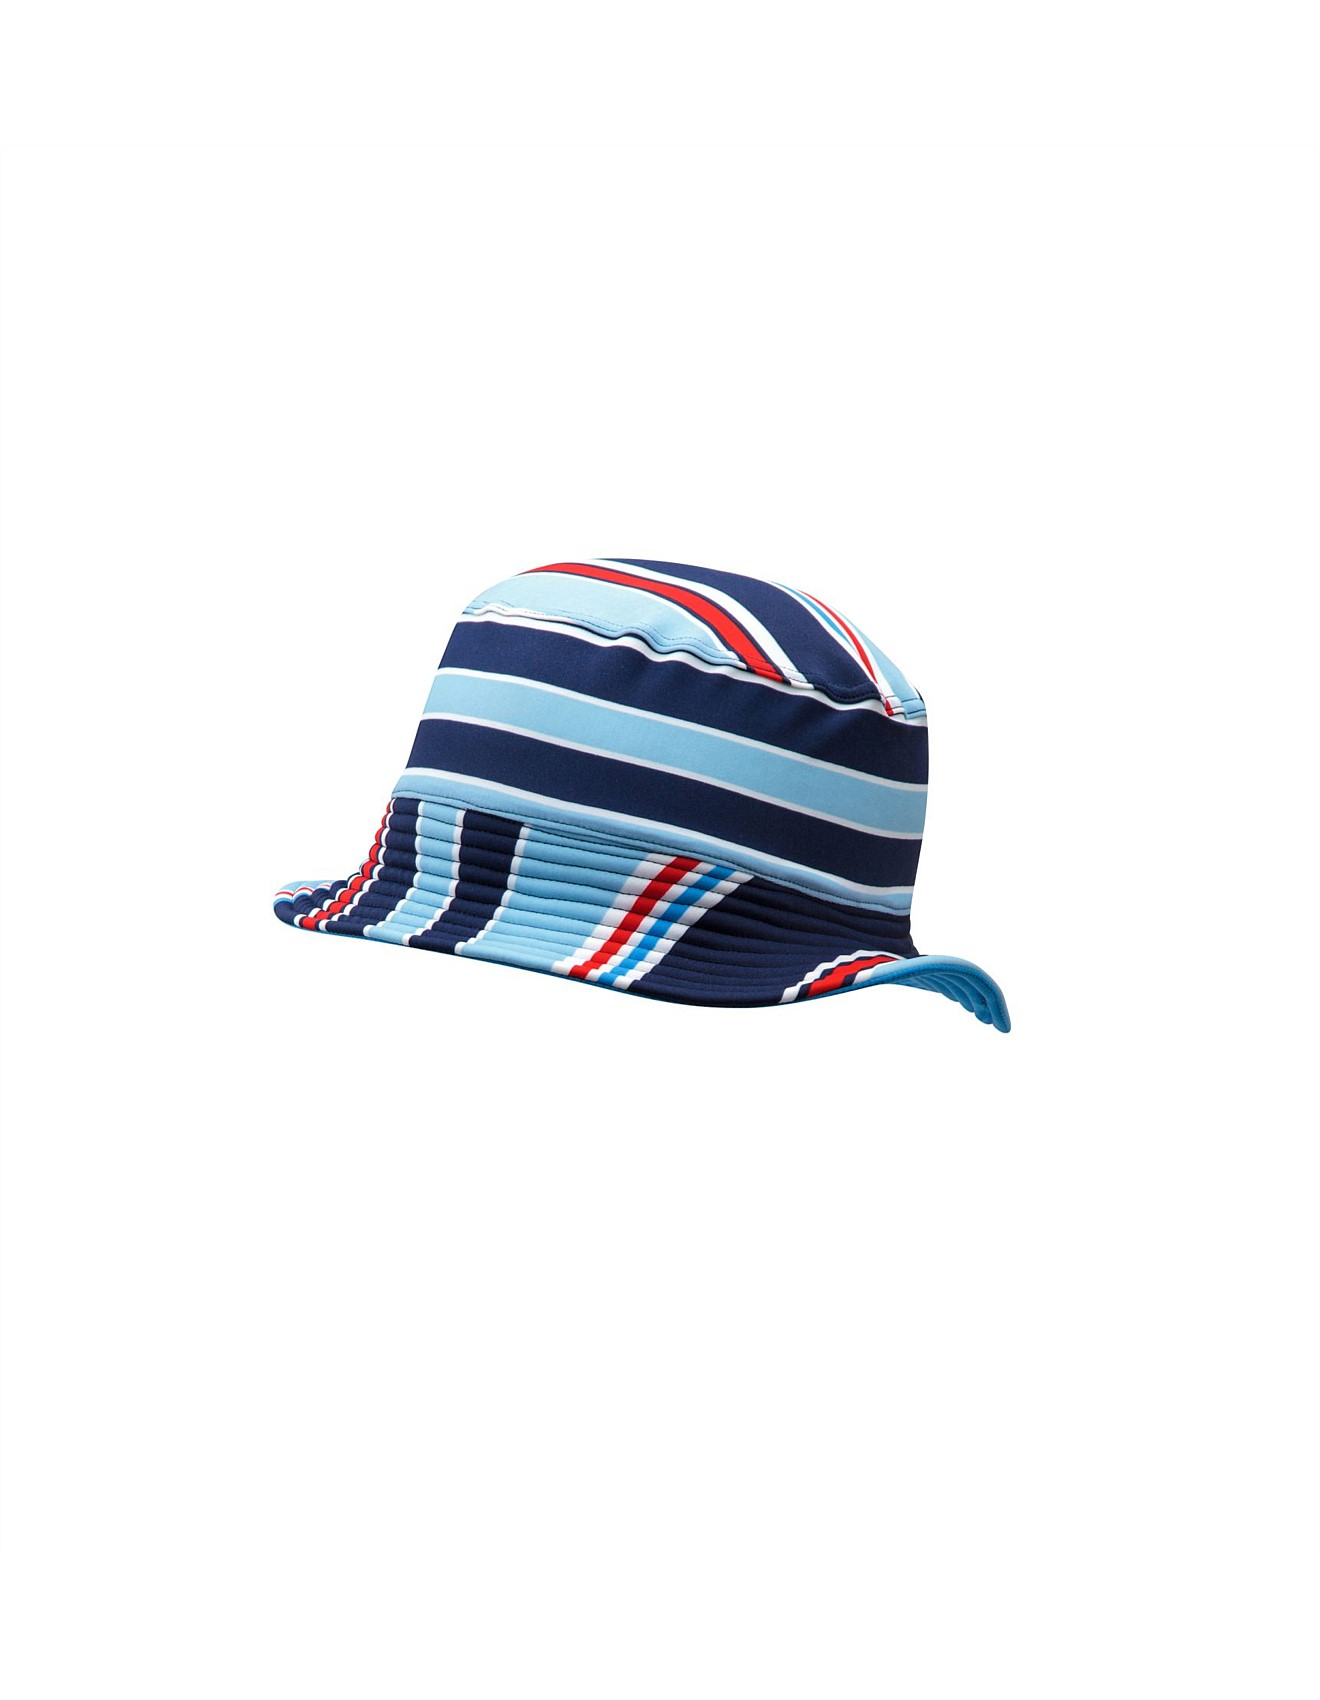 4825402b5ca Platypus Boys Bucket Hat (XS - S)